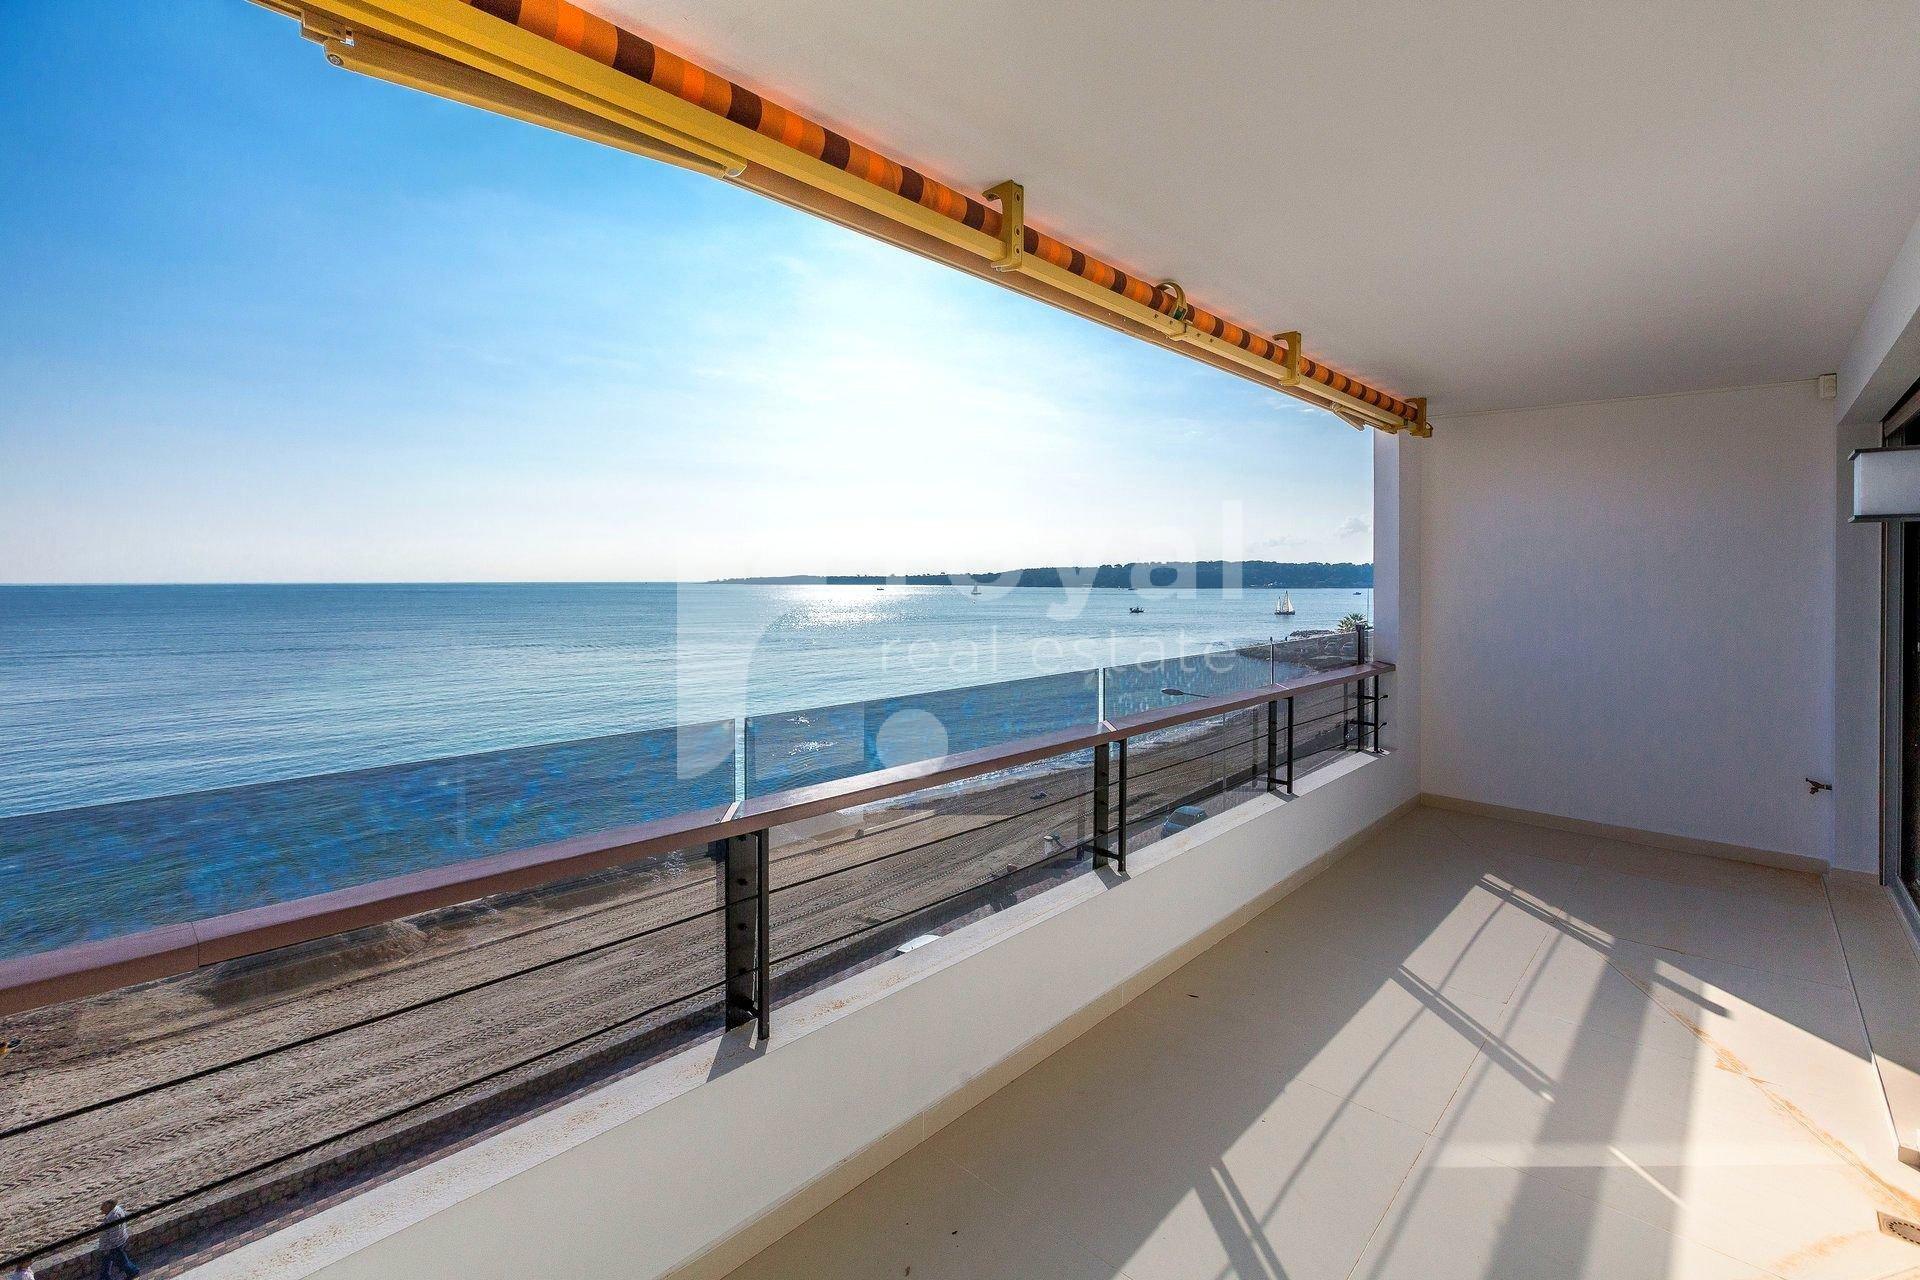 Amaizing sea view !